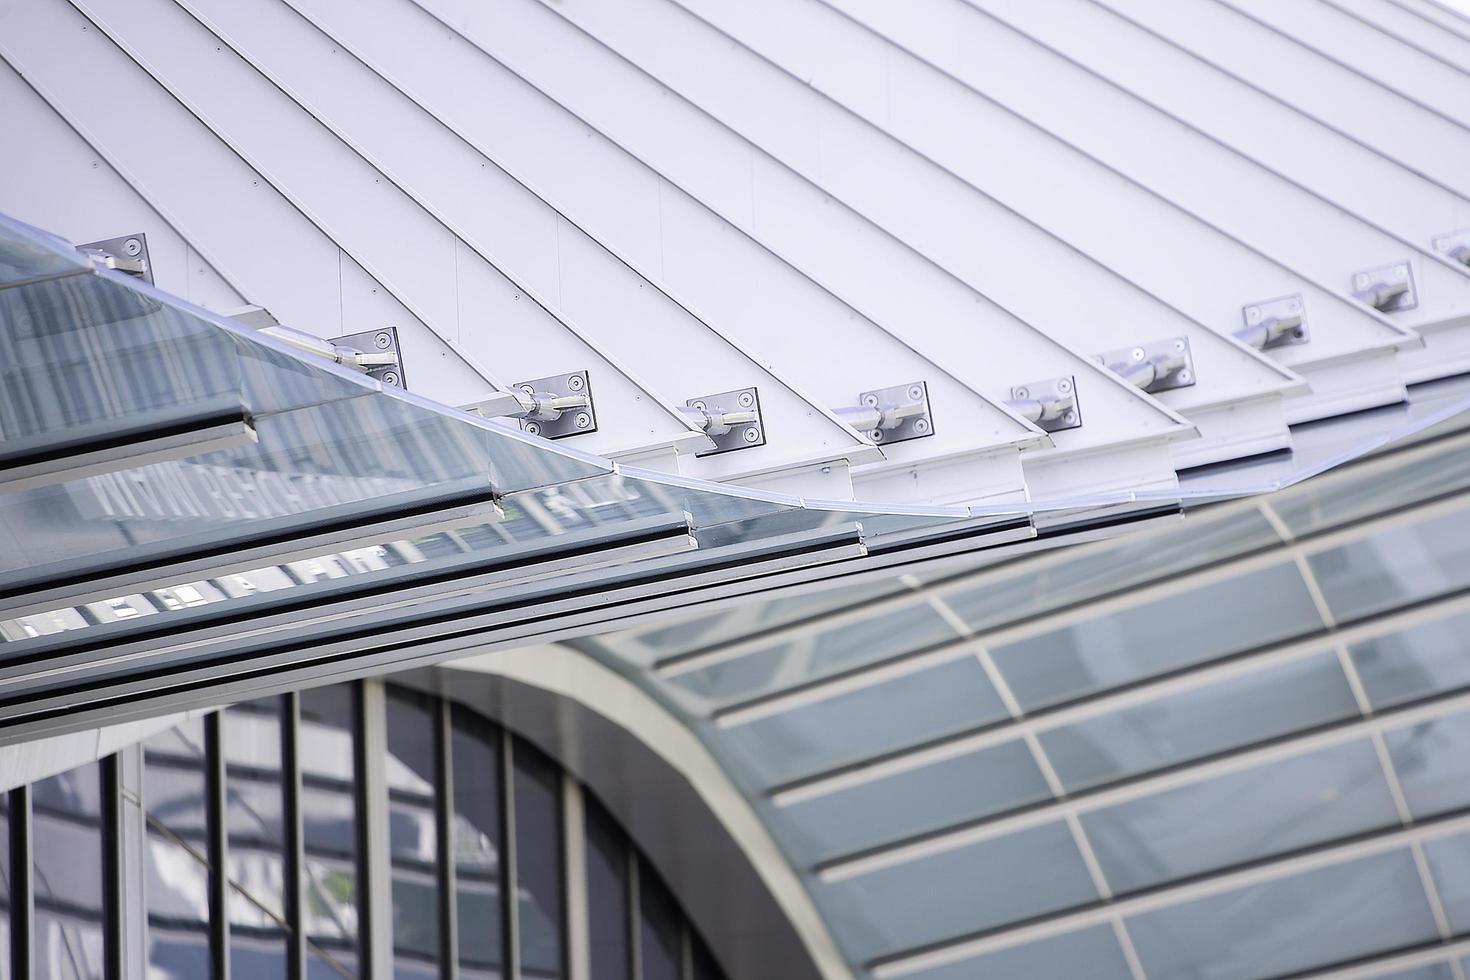 Miami, Florida, 2020 - Modern glass building photo